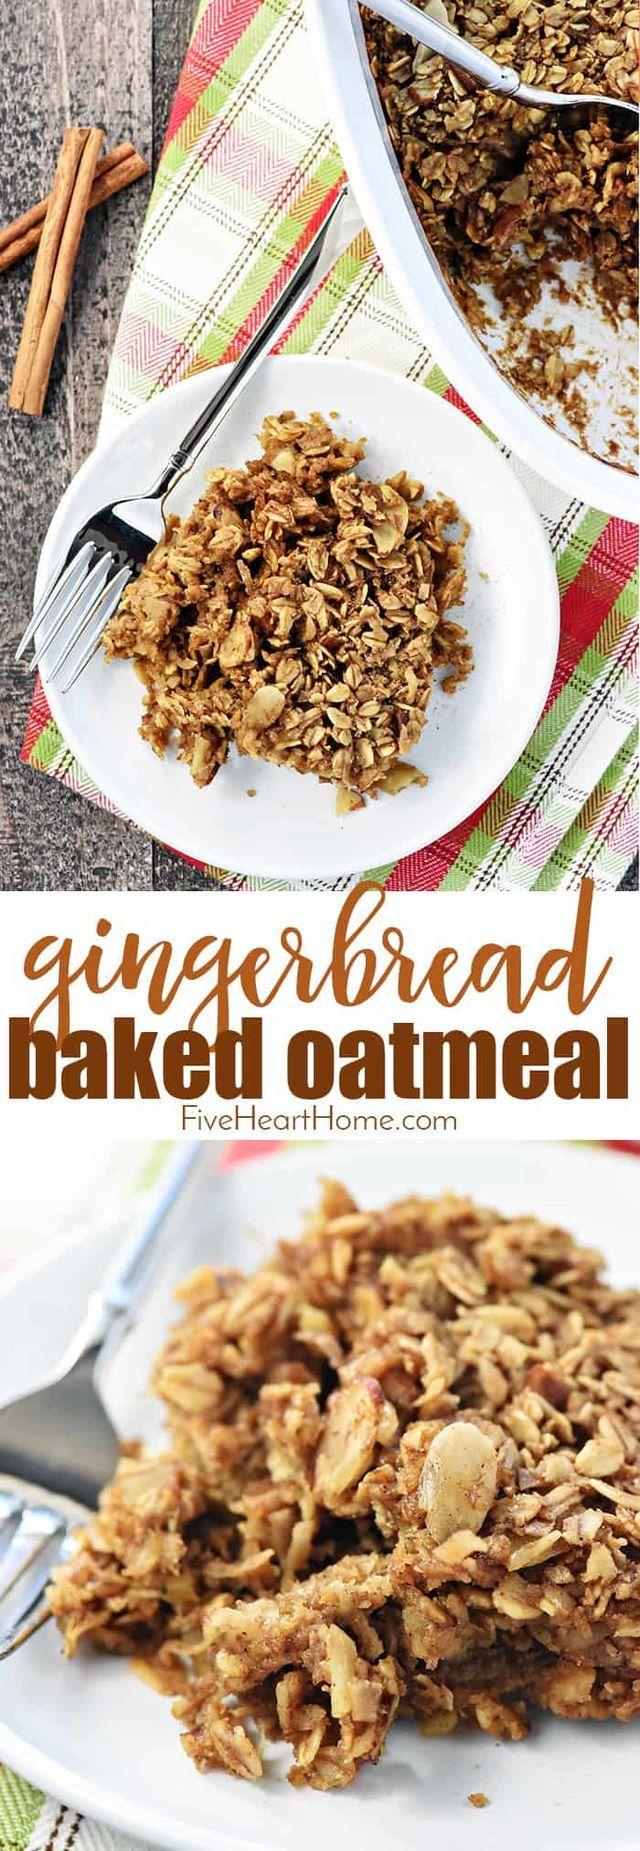 Gingerbread Baked Oatmeal Fivehearthome Winter Breakfast Quaker Oats Recipes Baked Oatmeal